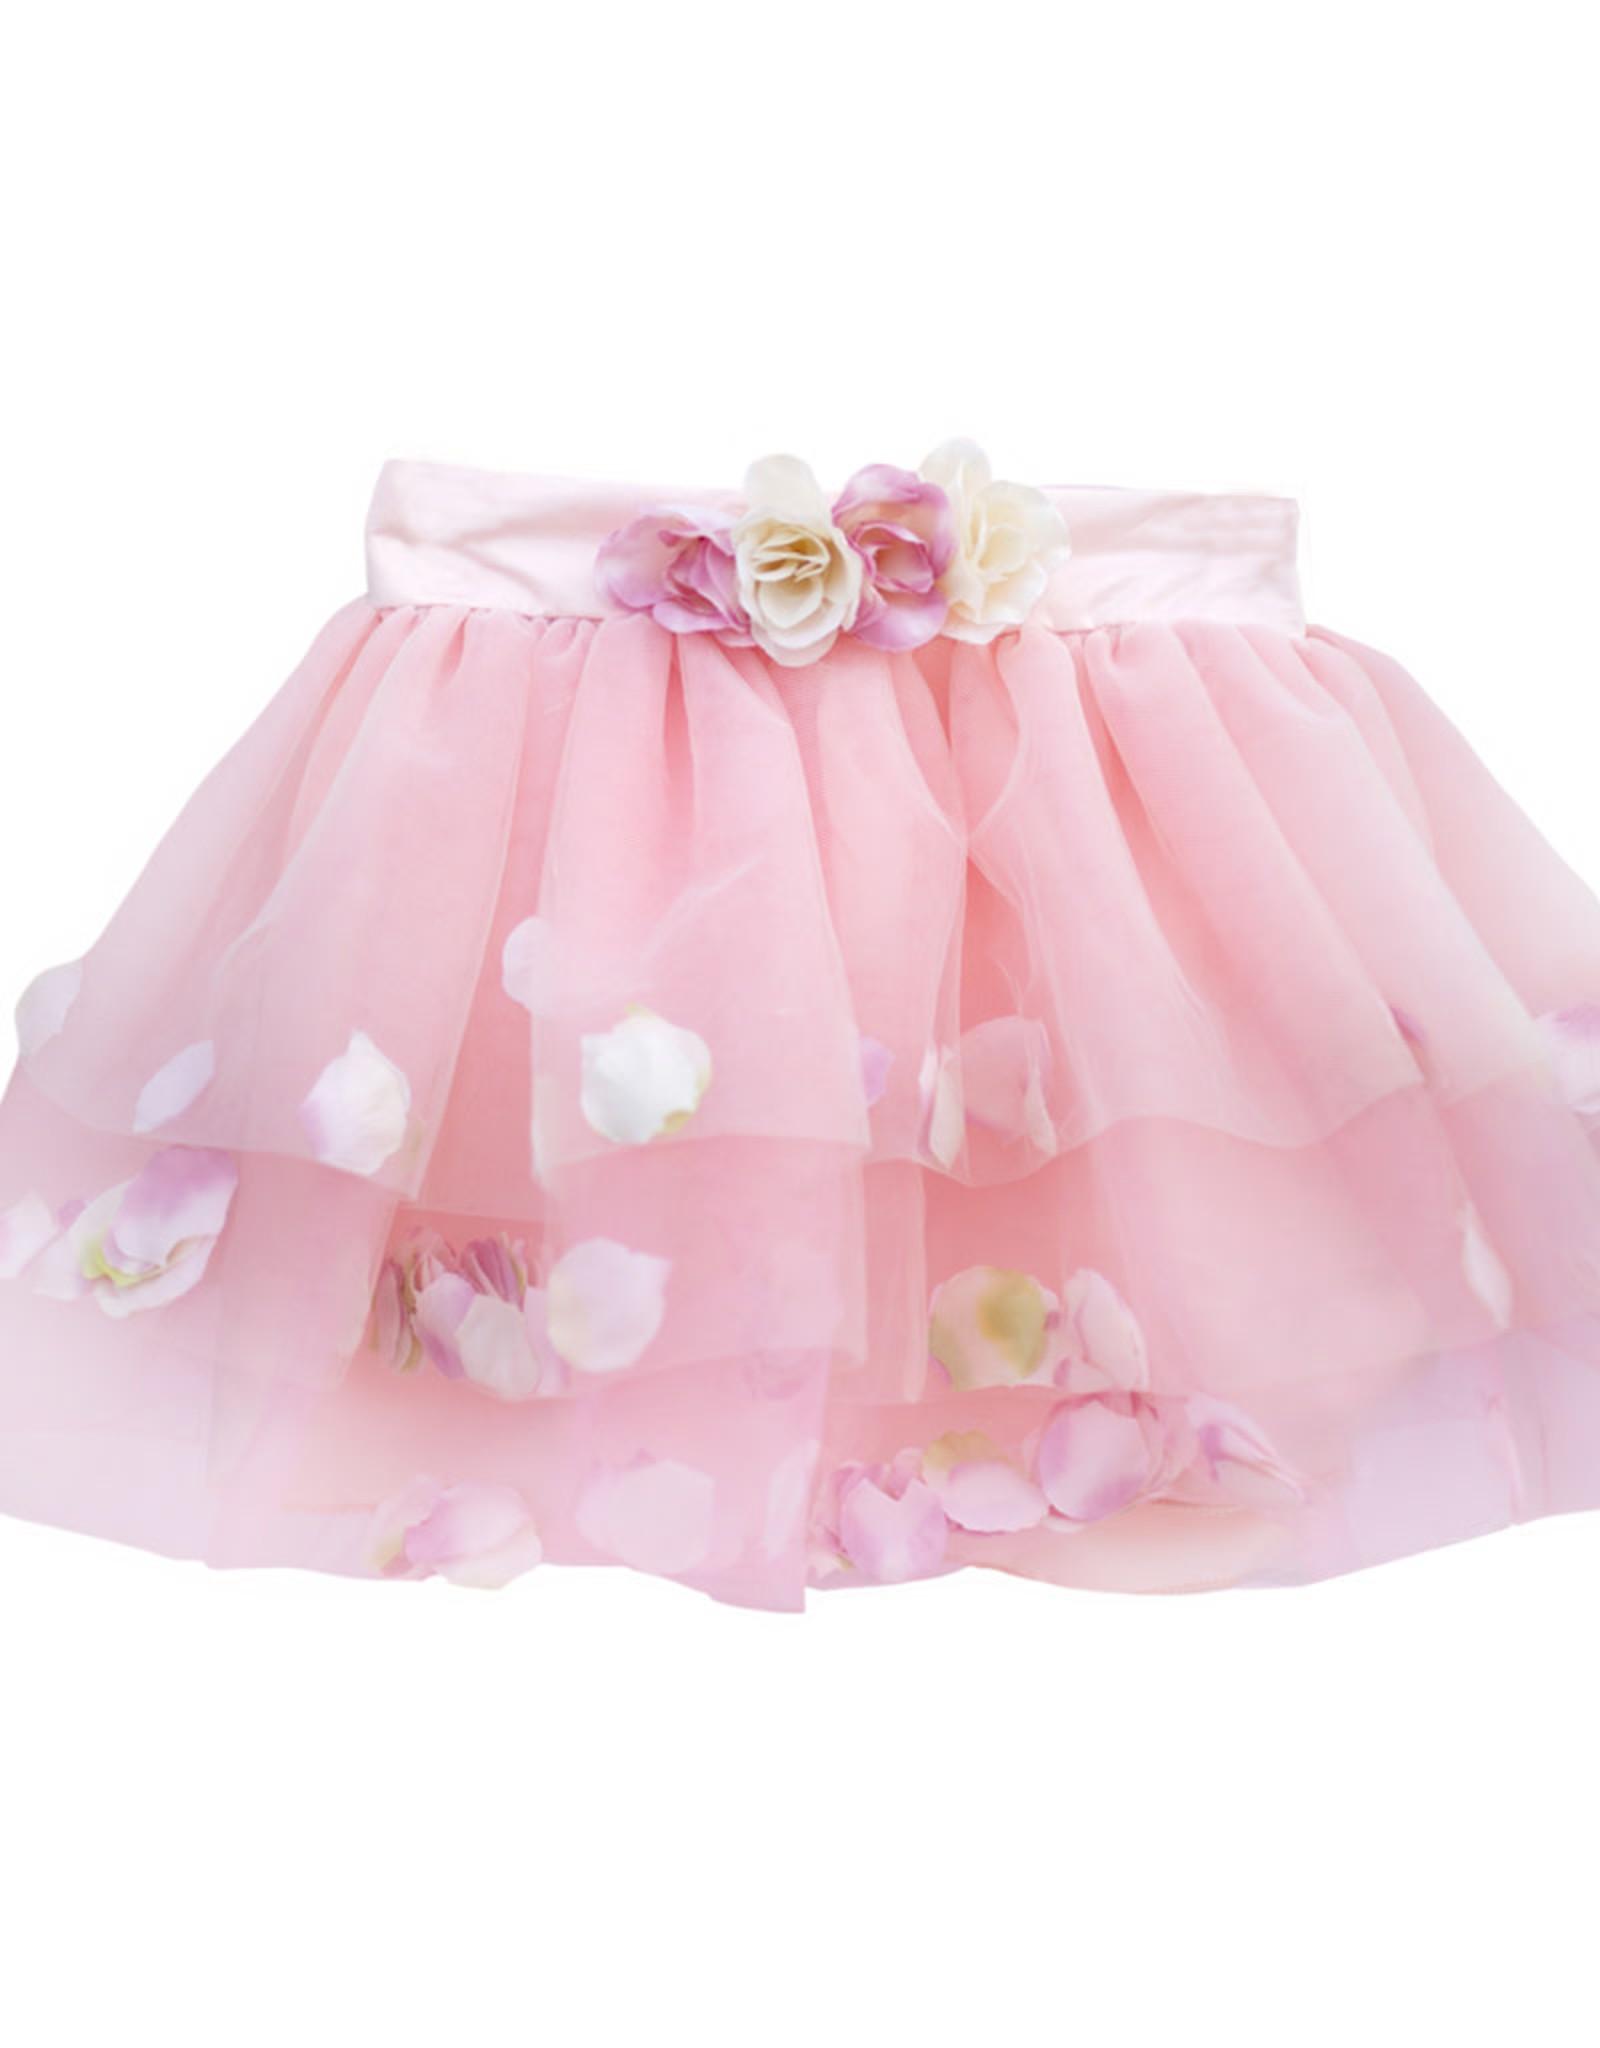 Great Pretenders Golden Rose Petal Skirt  - Size 4-6